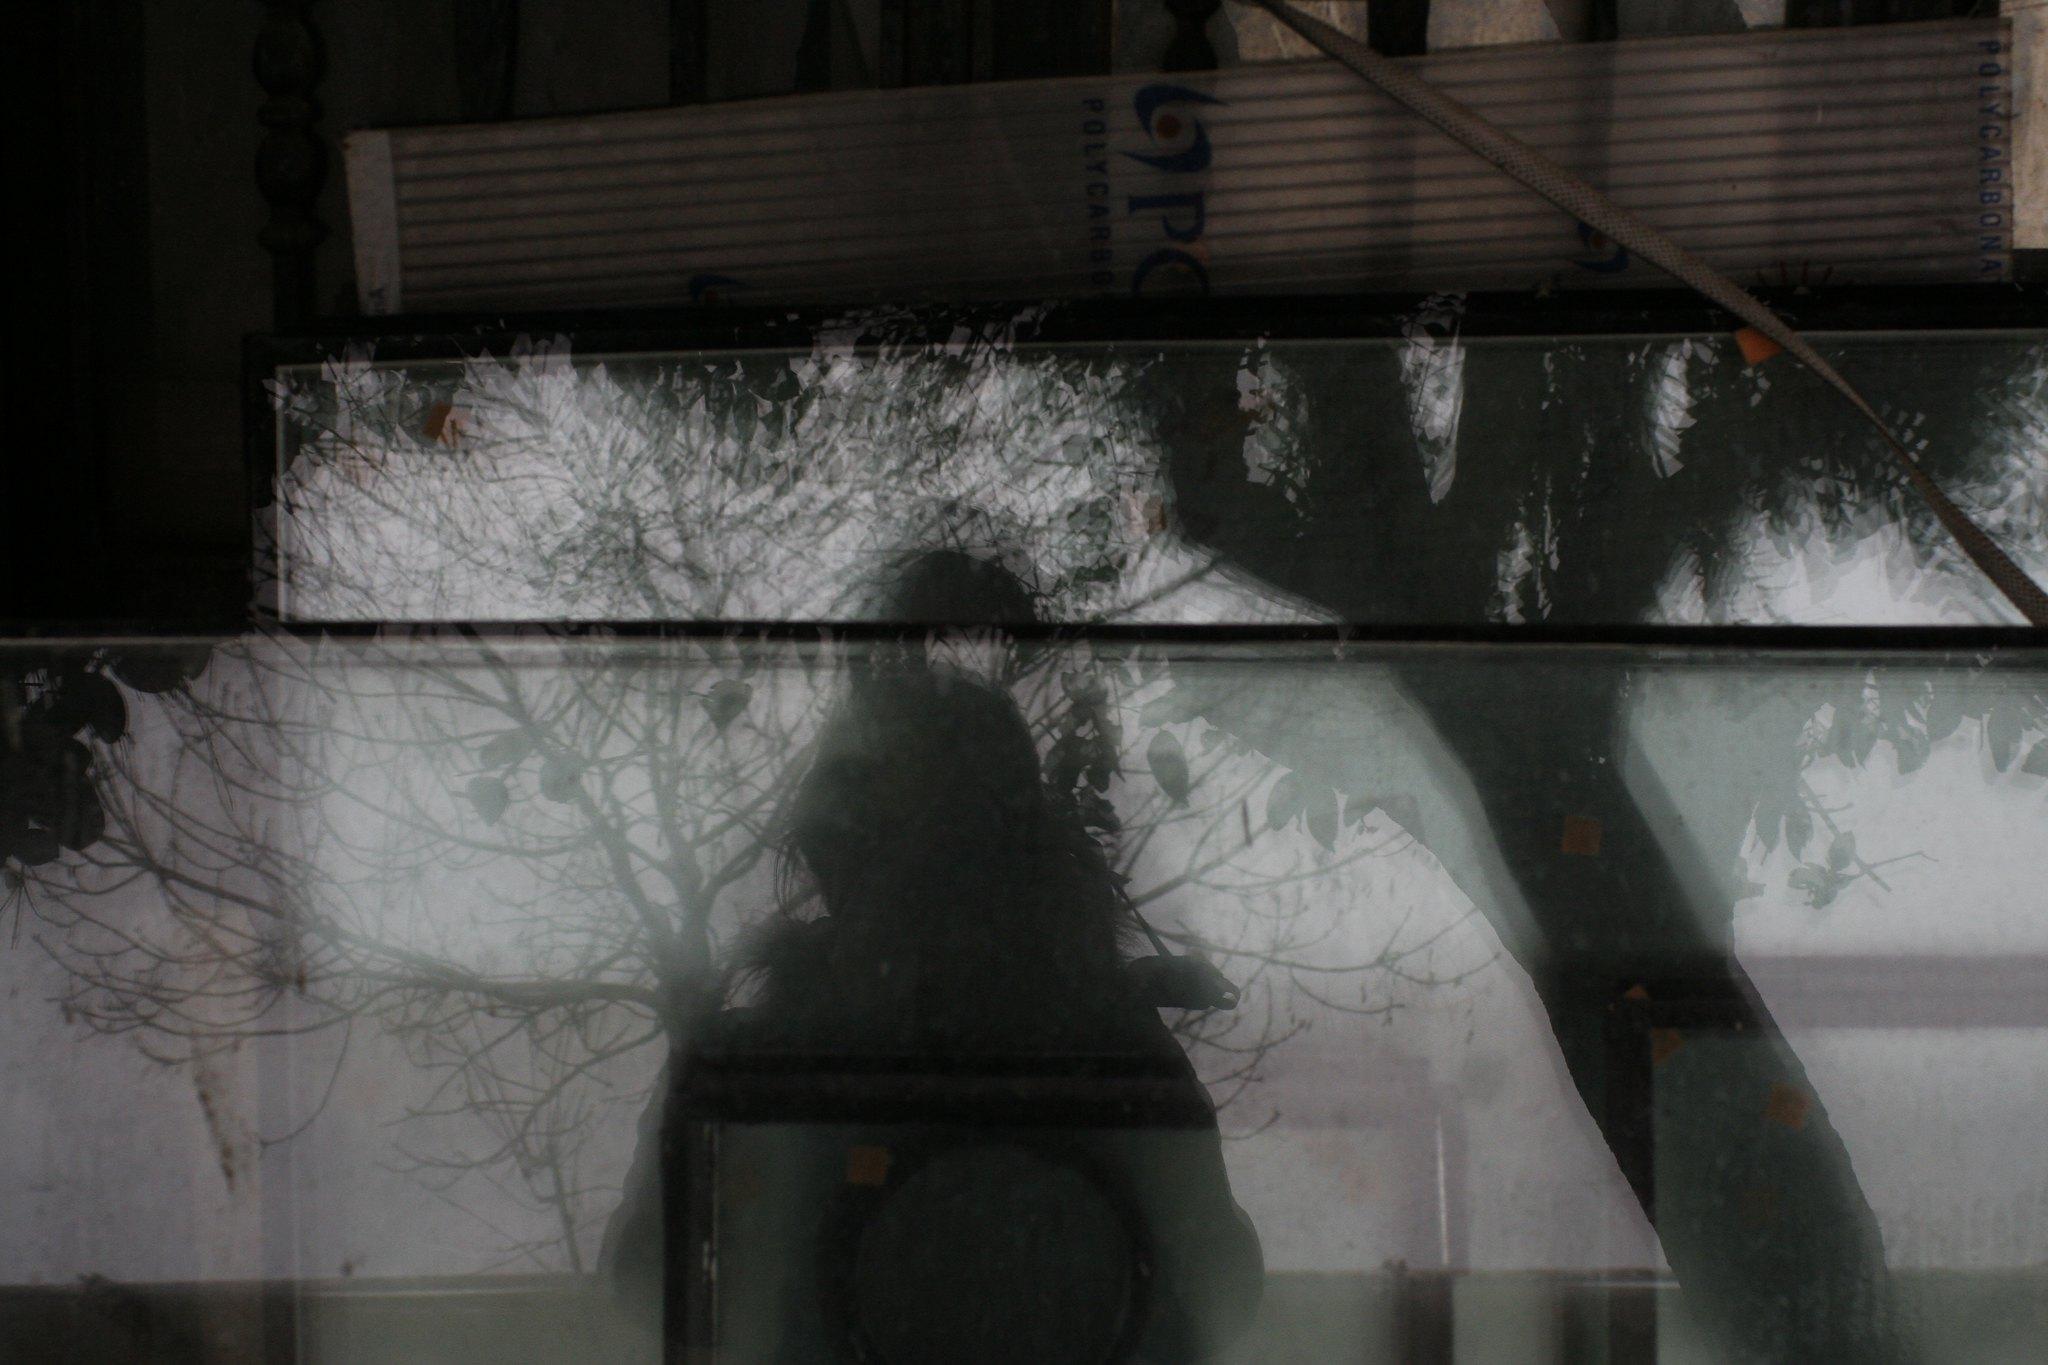 Outside the glazier